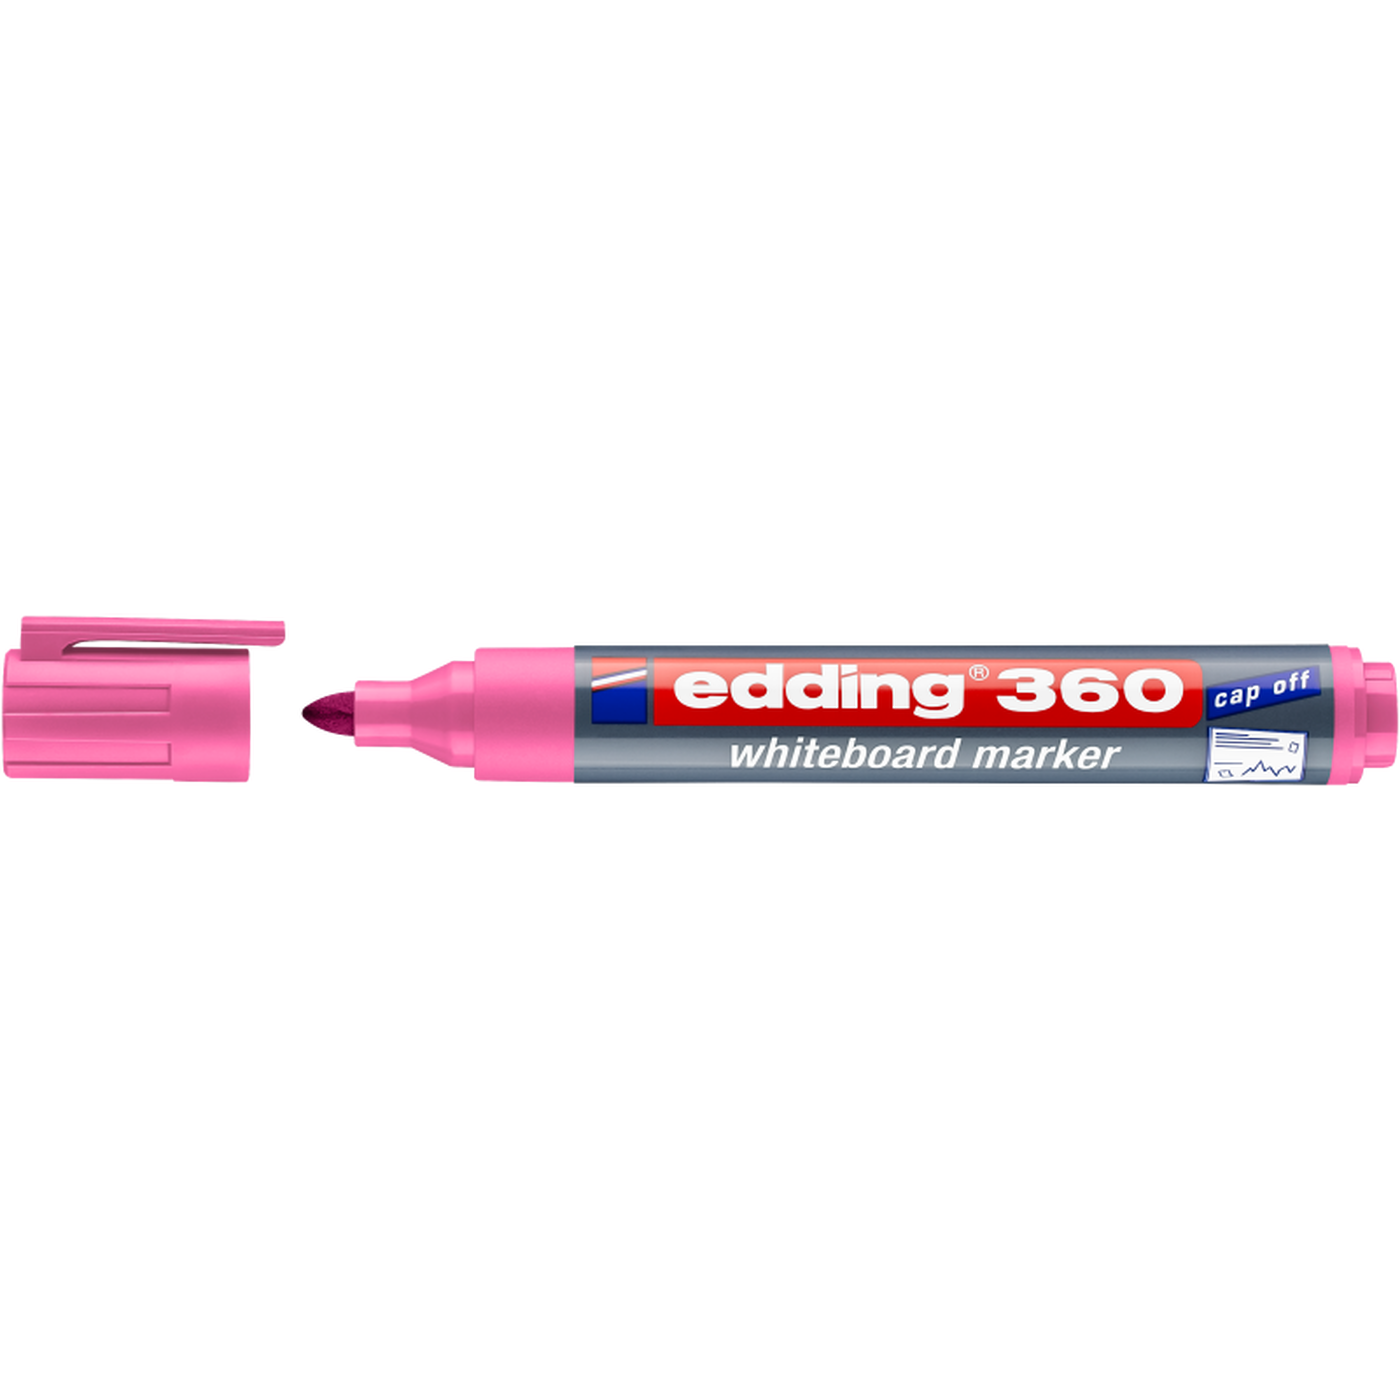 EDDING 360 WHITEBOARD MARKER (PINK)